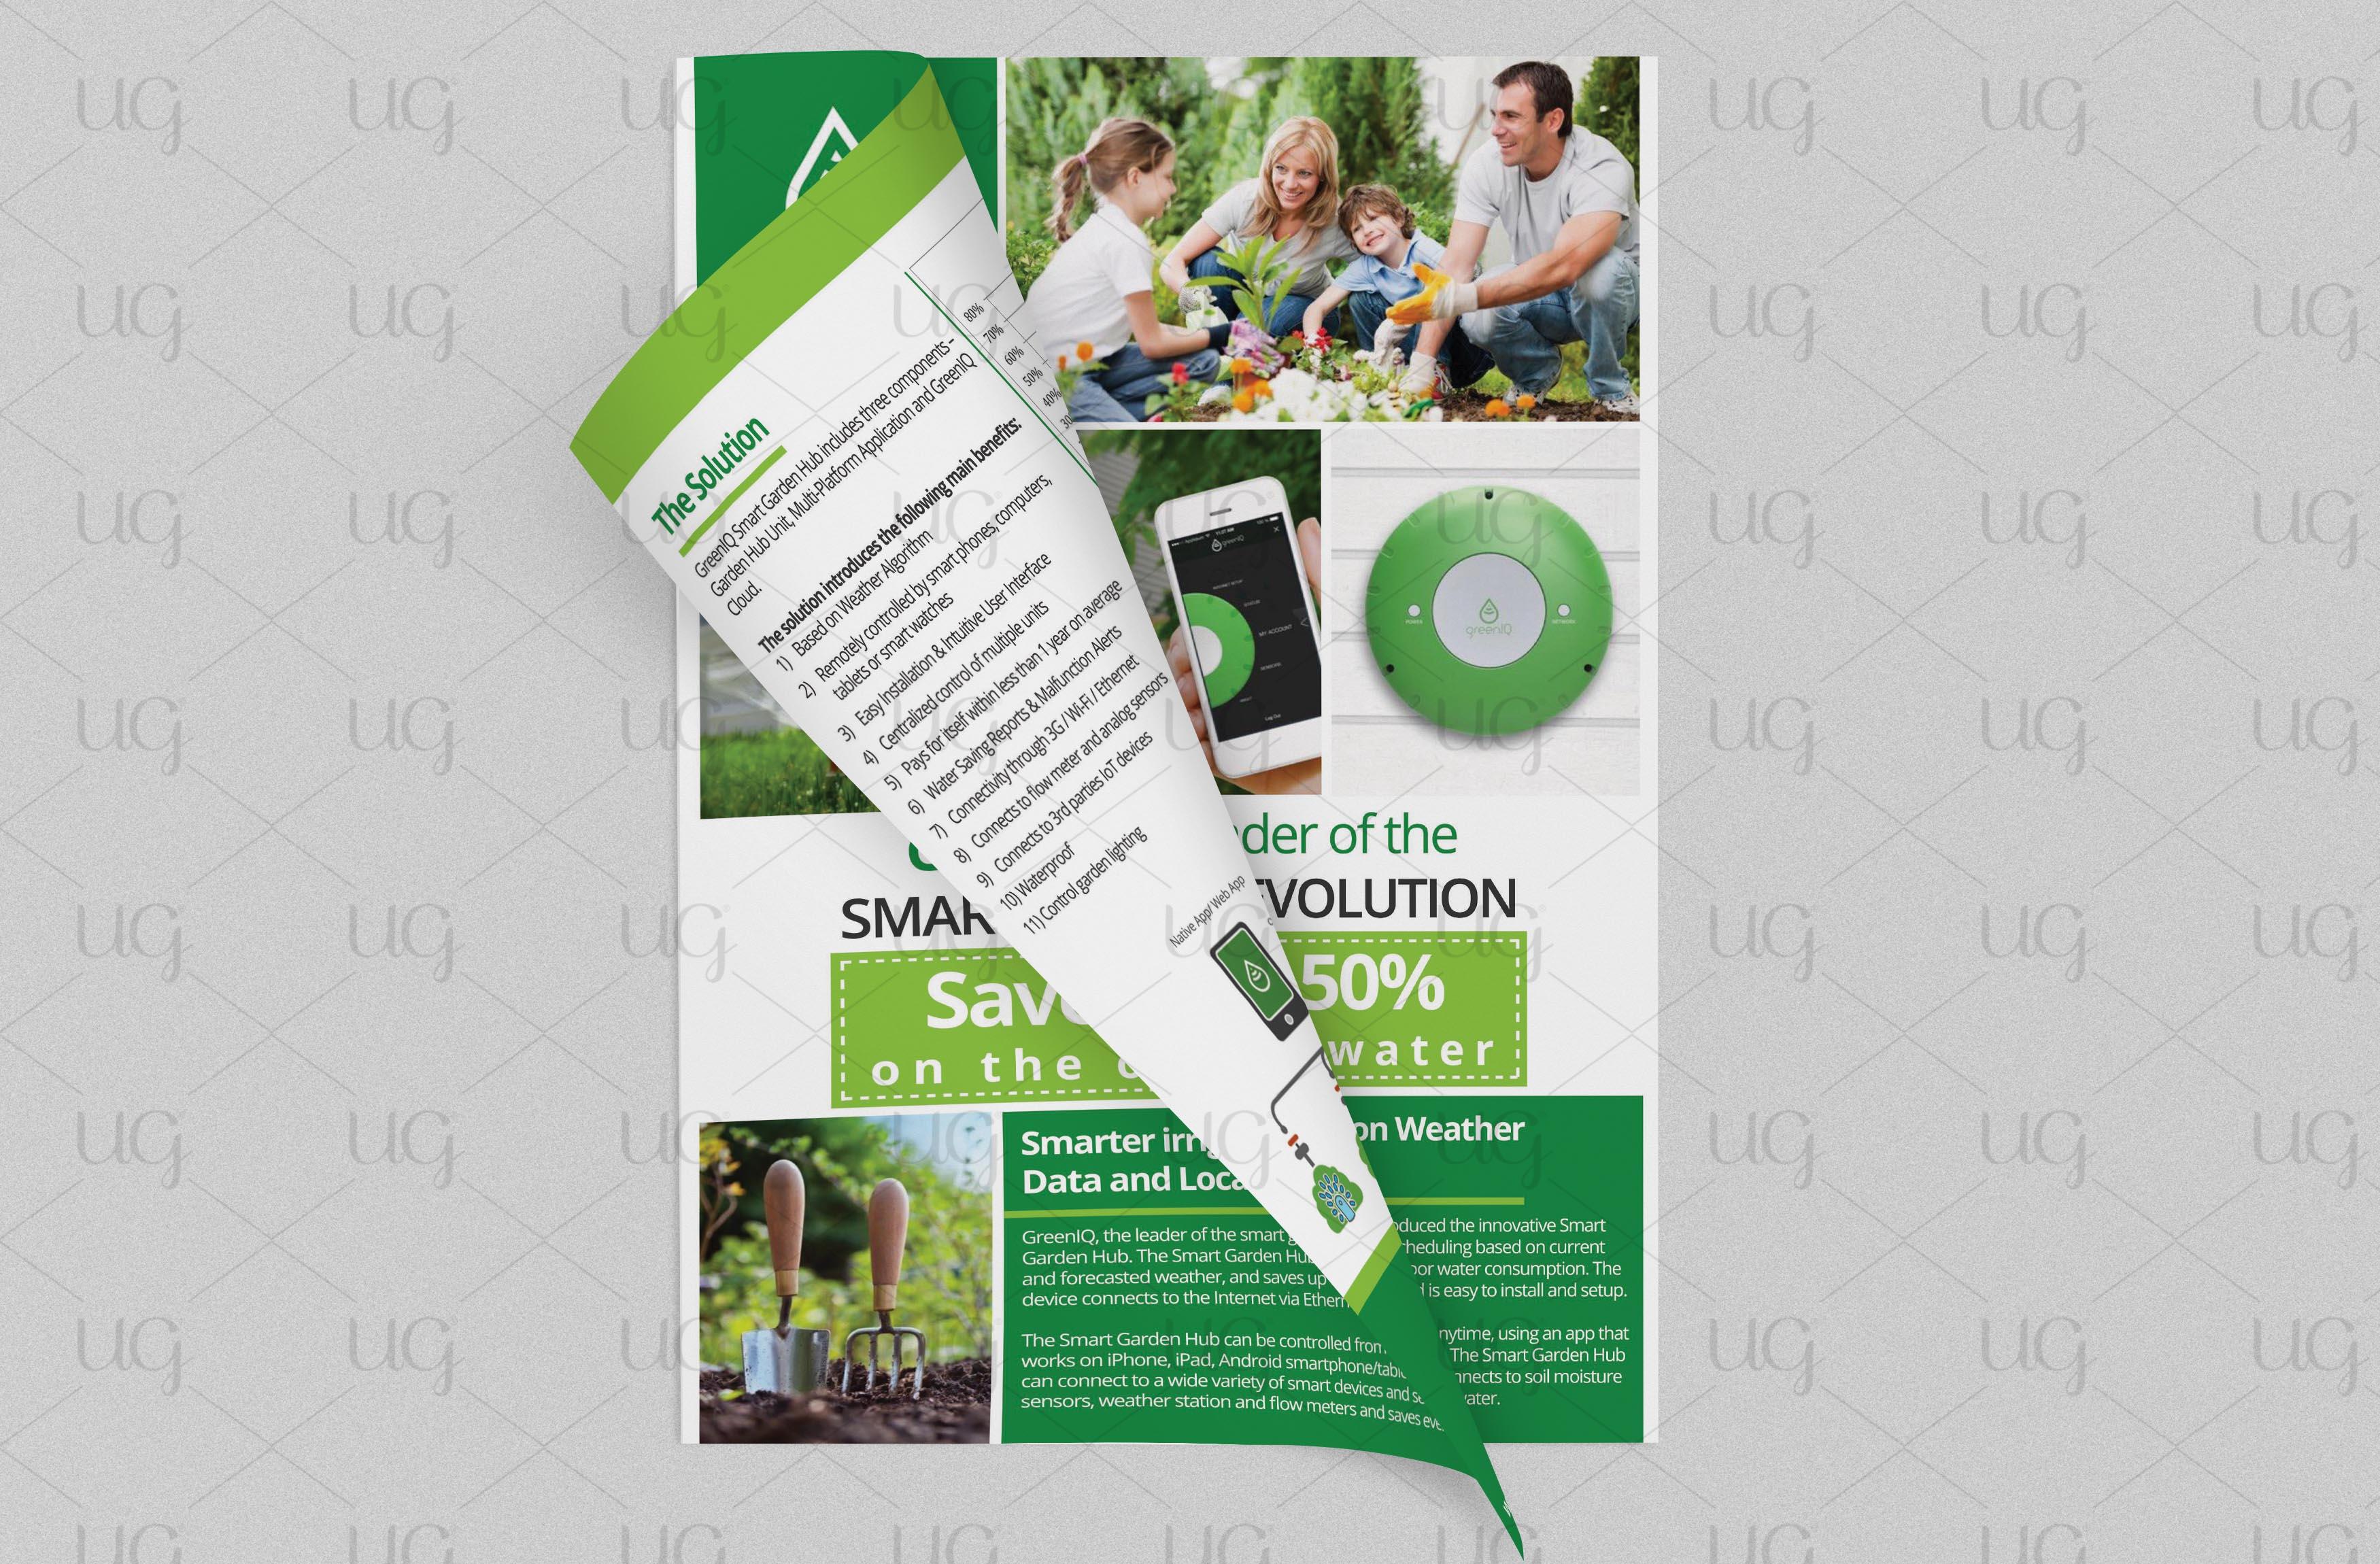 Green IQ flyer final look by ug2